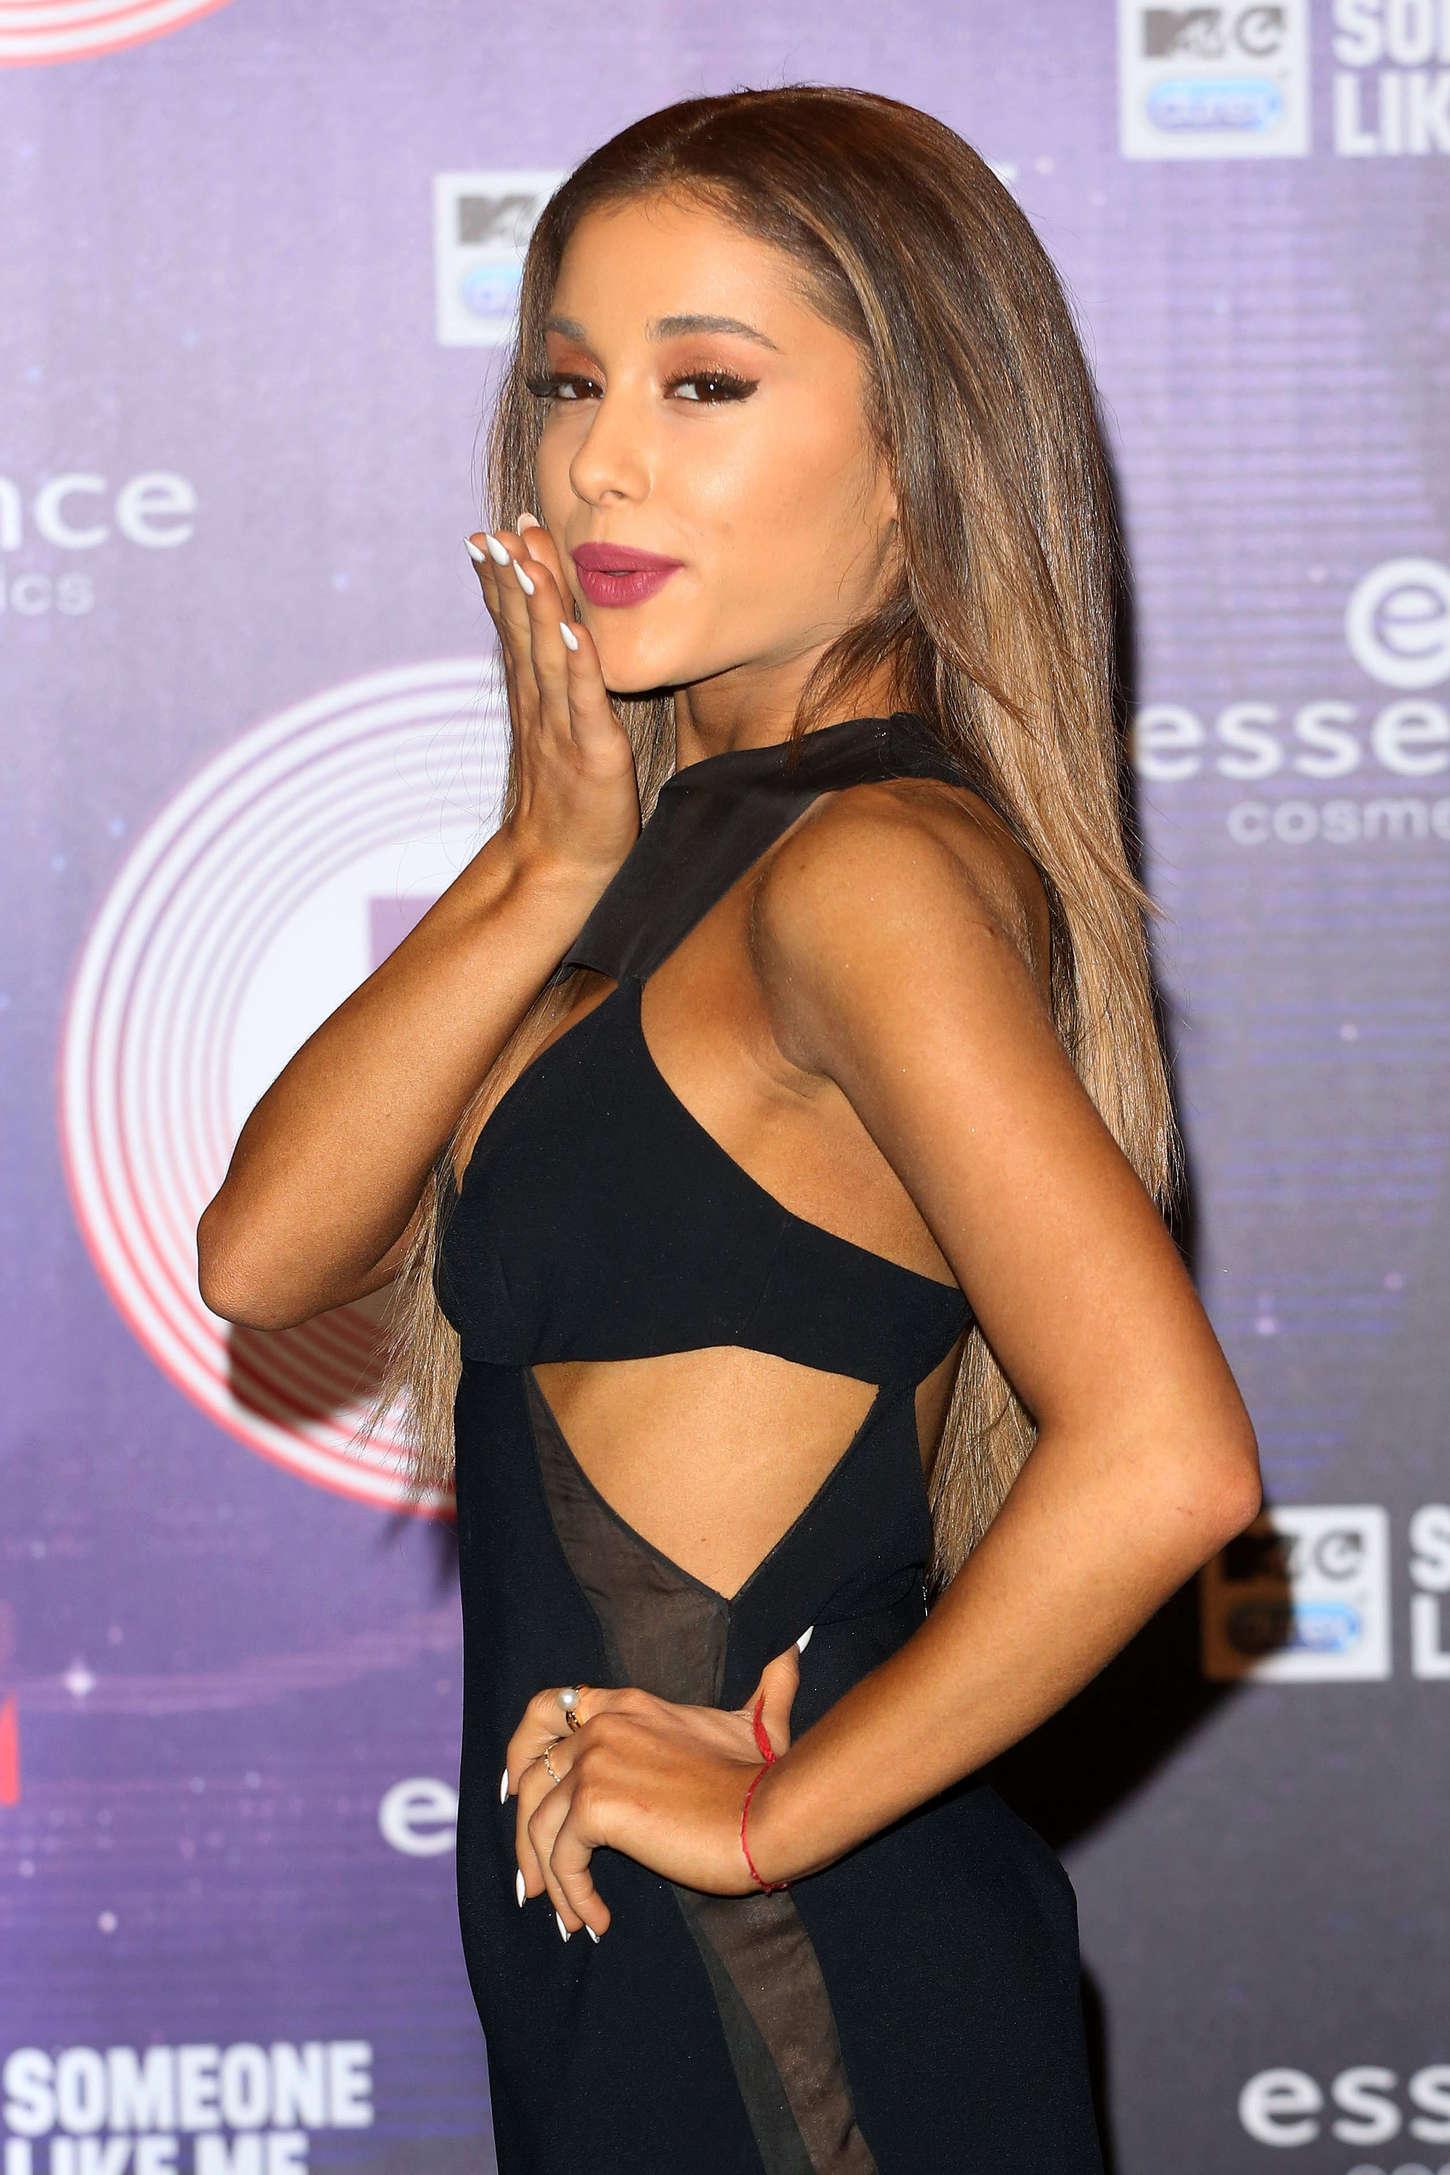 Ariana Grande in Silver Bodysuit at MTV EMA 2014 -06